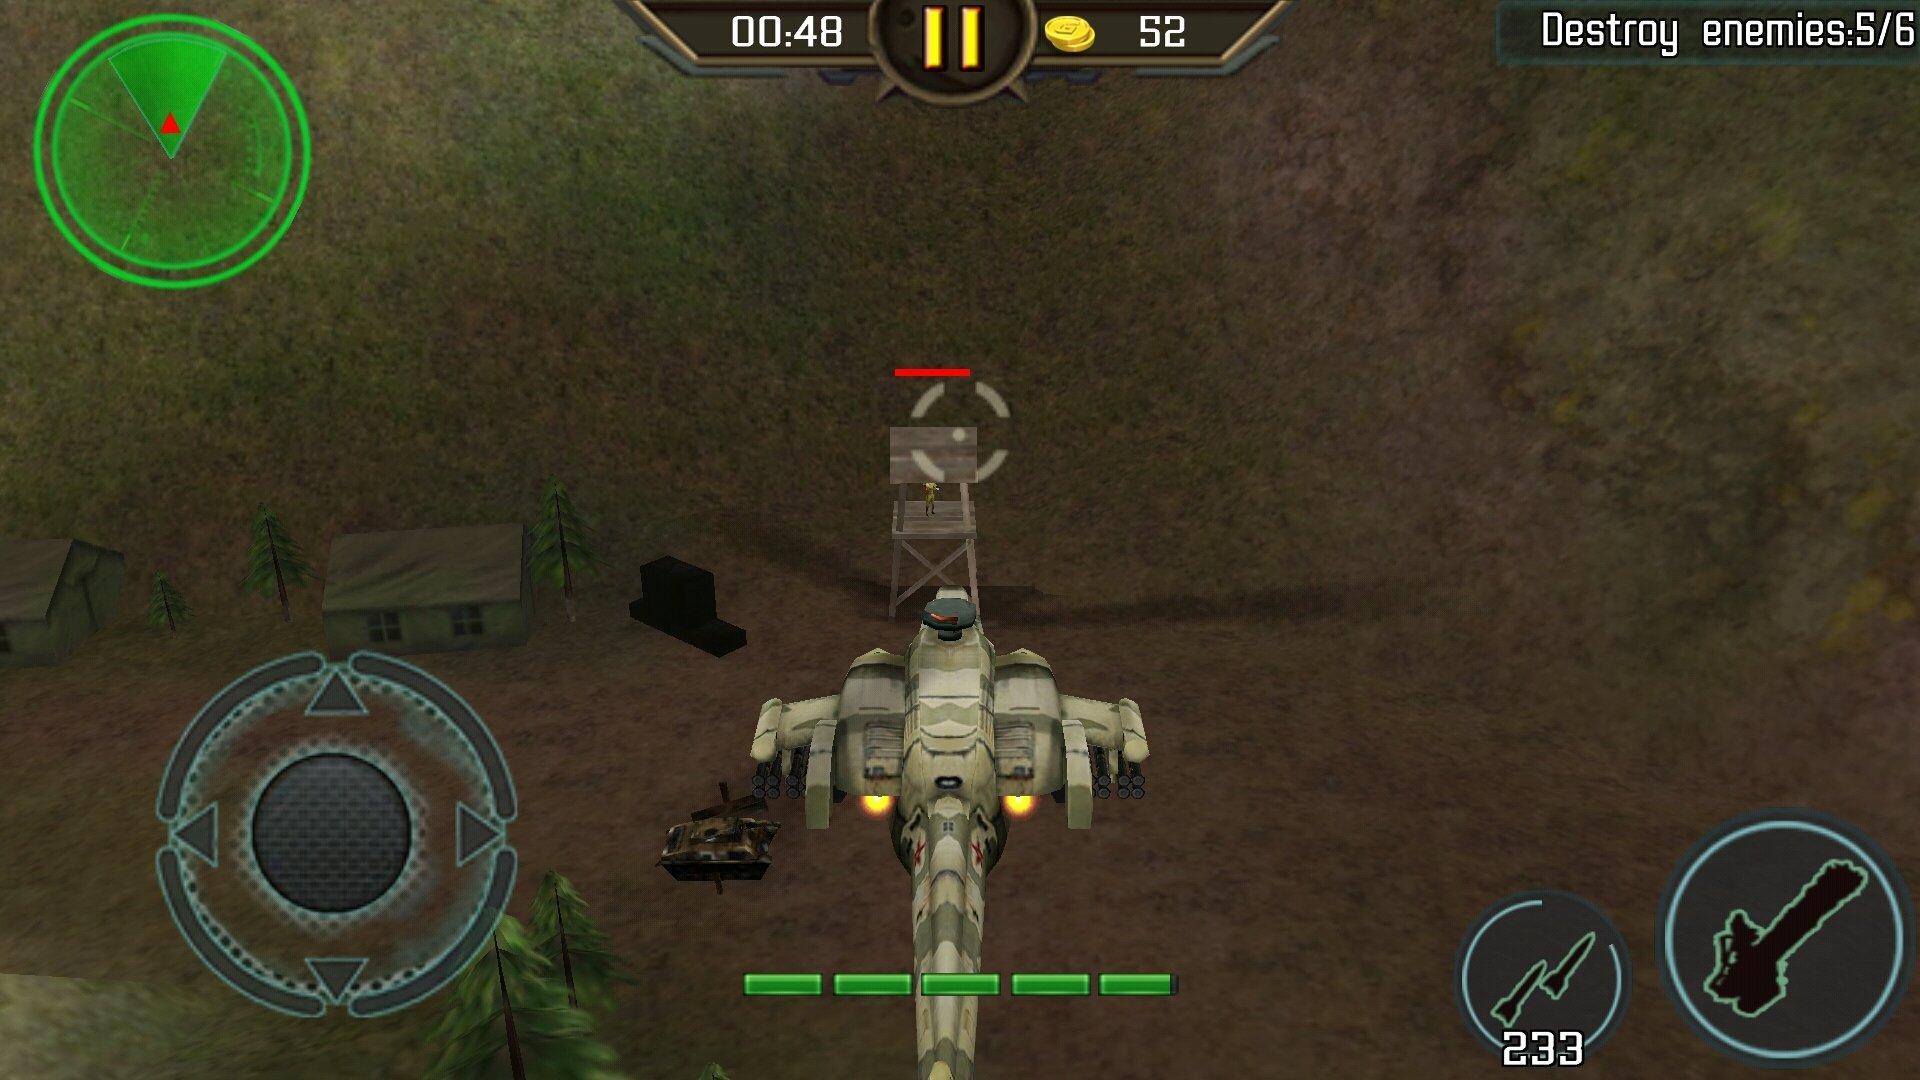 raid aérien de lhélicoptère uptodown